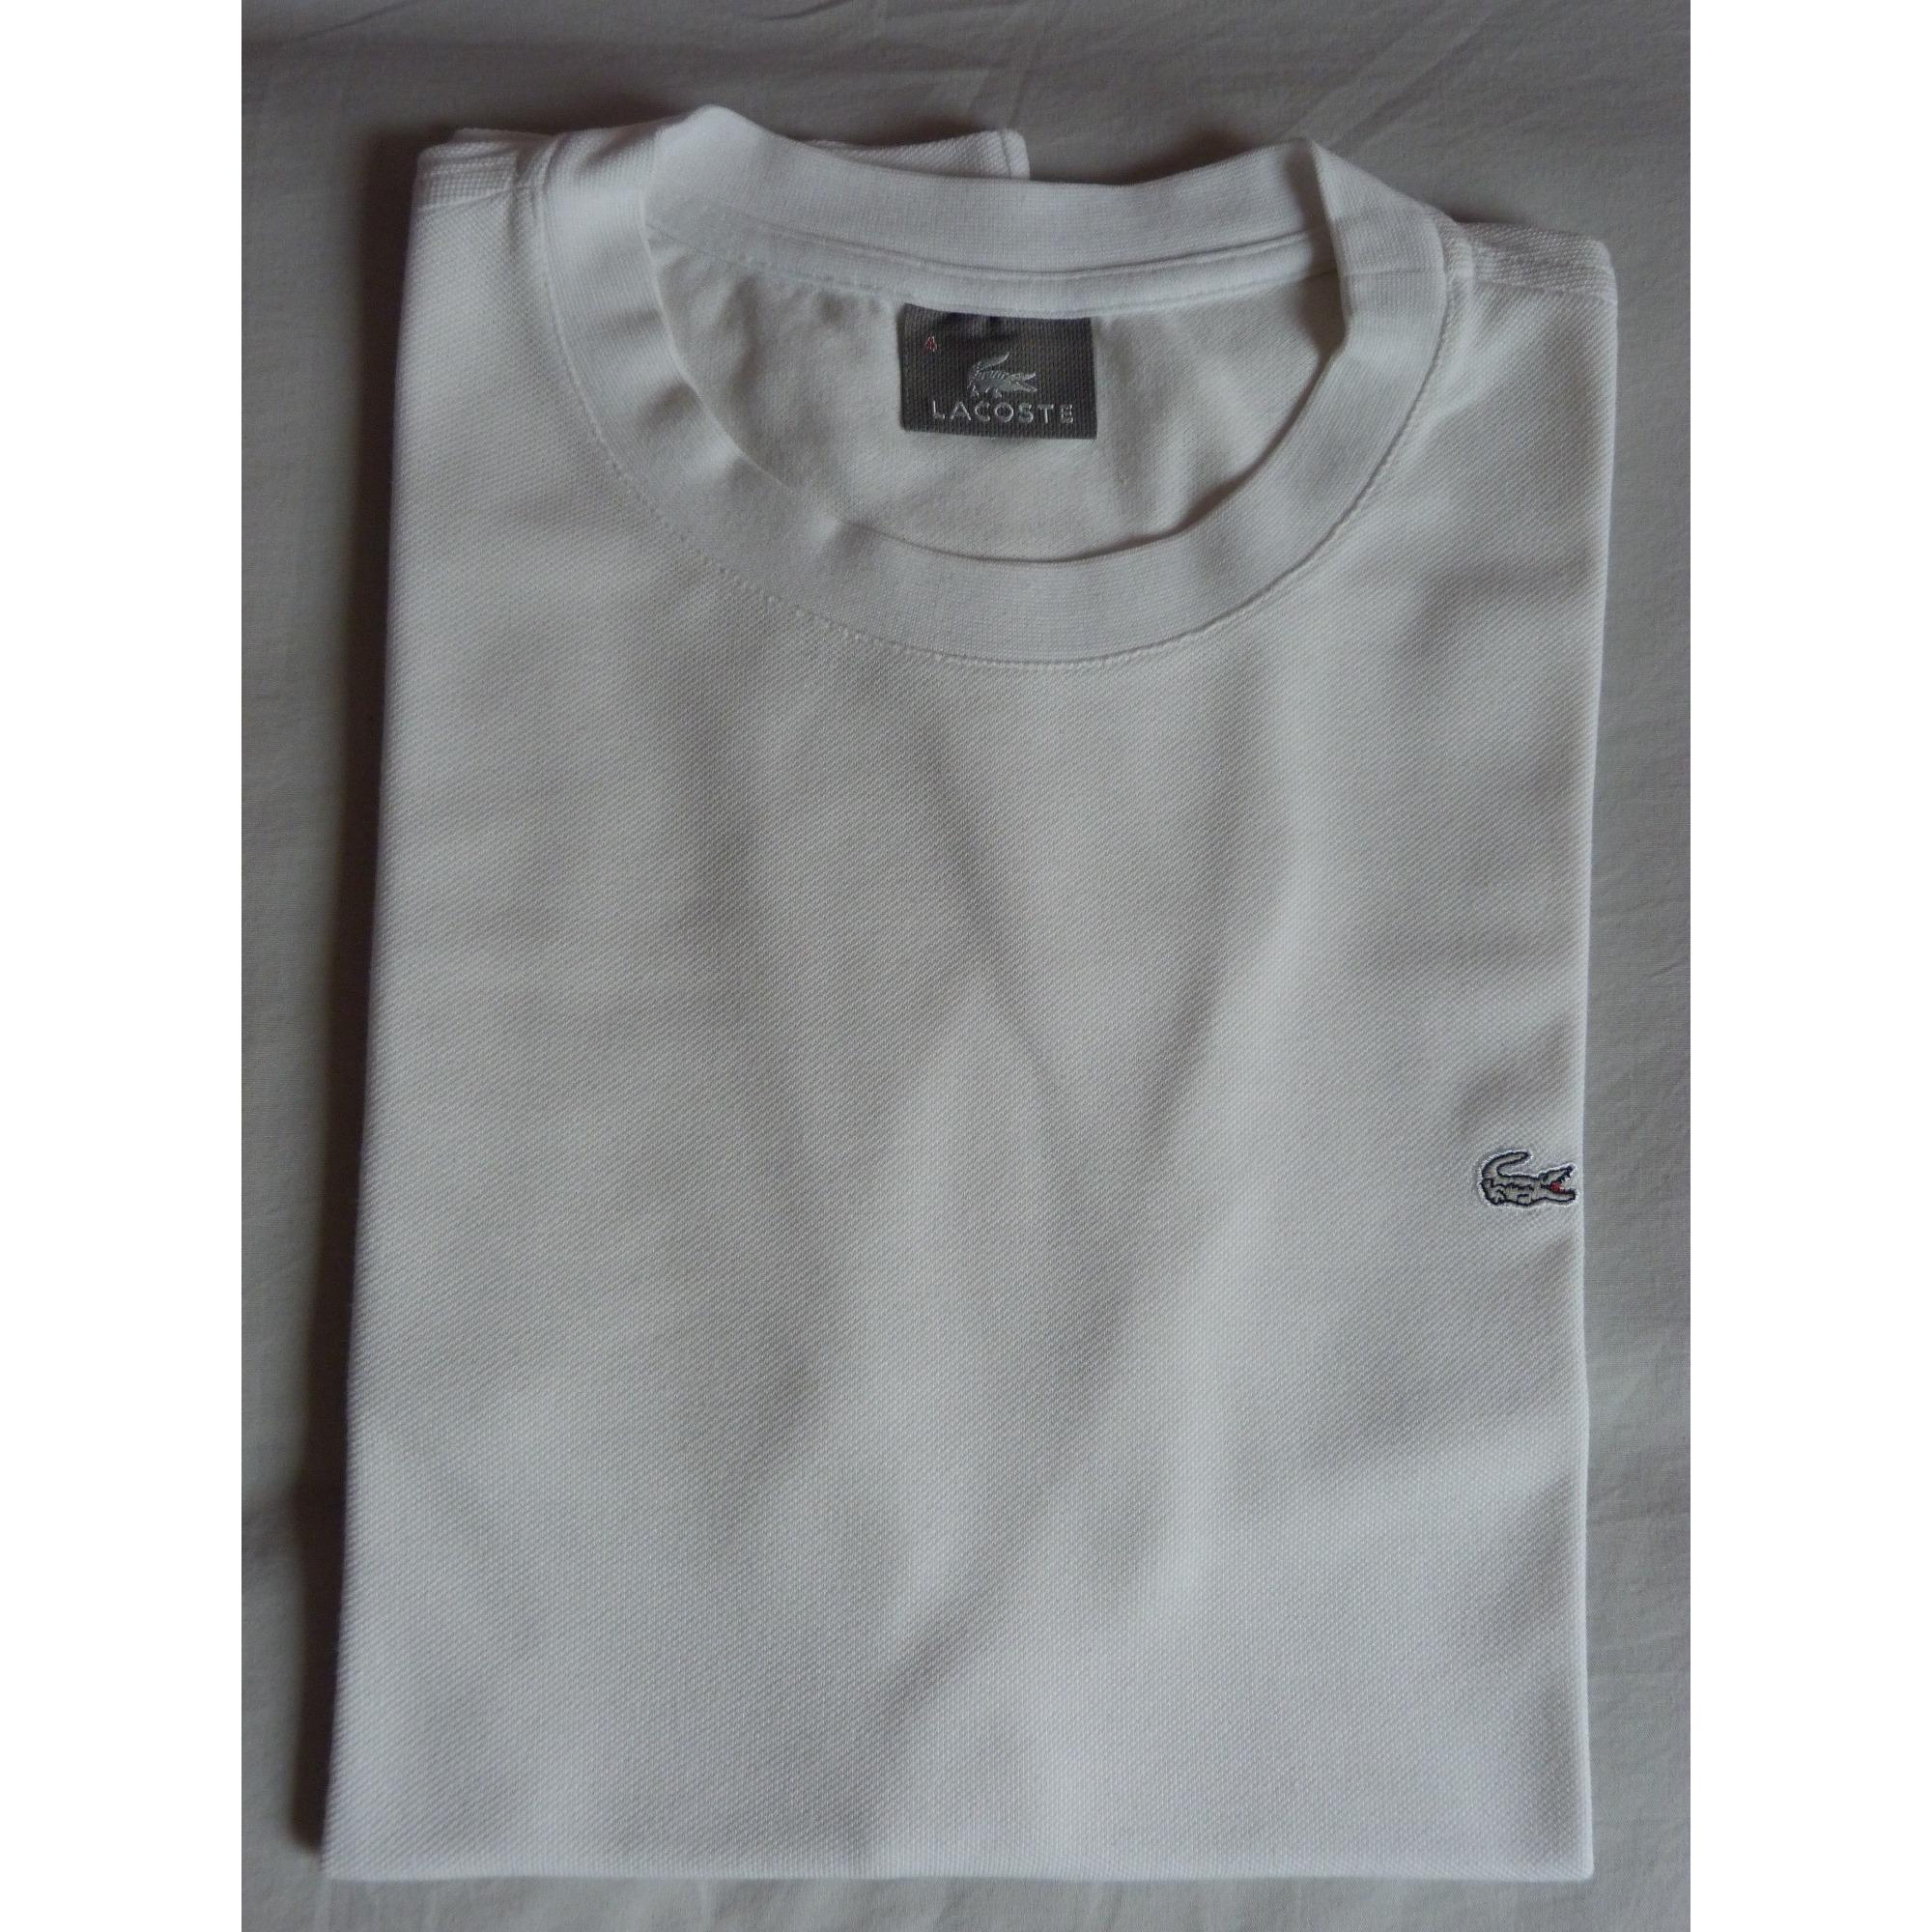 4fad99bd35 Tee-shirt LACOSTE Blanc, blanc cassé, écru